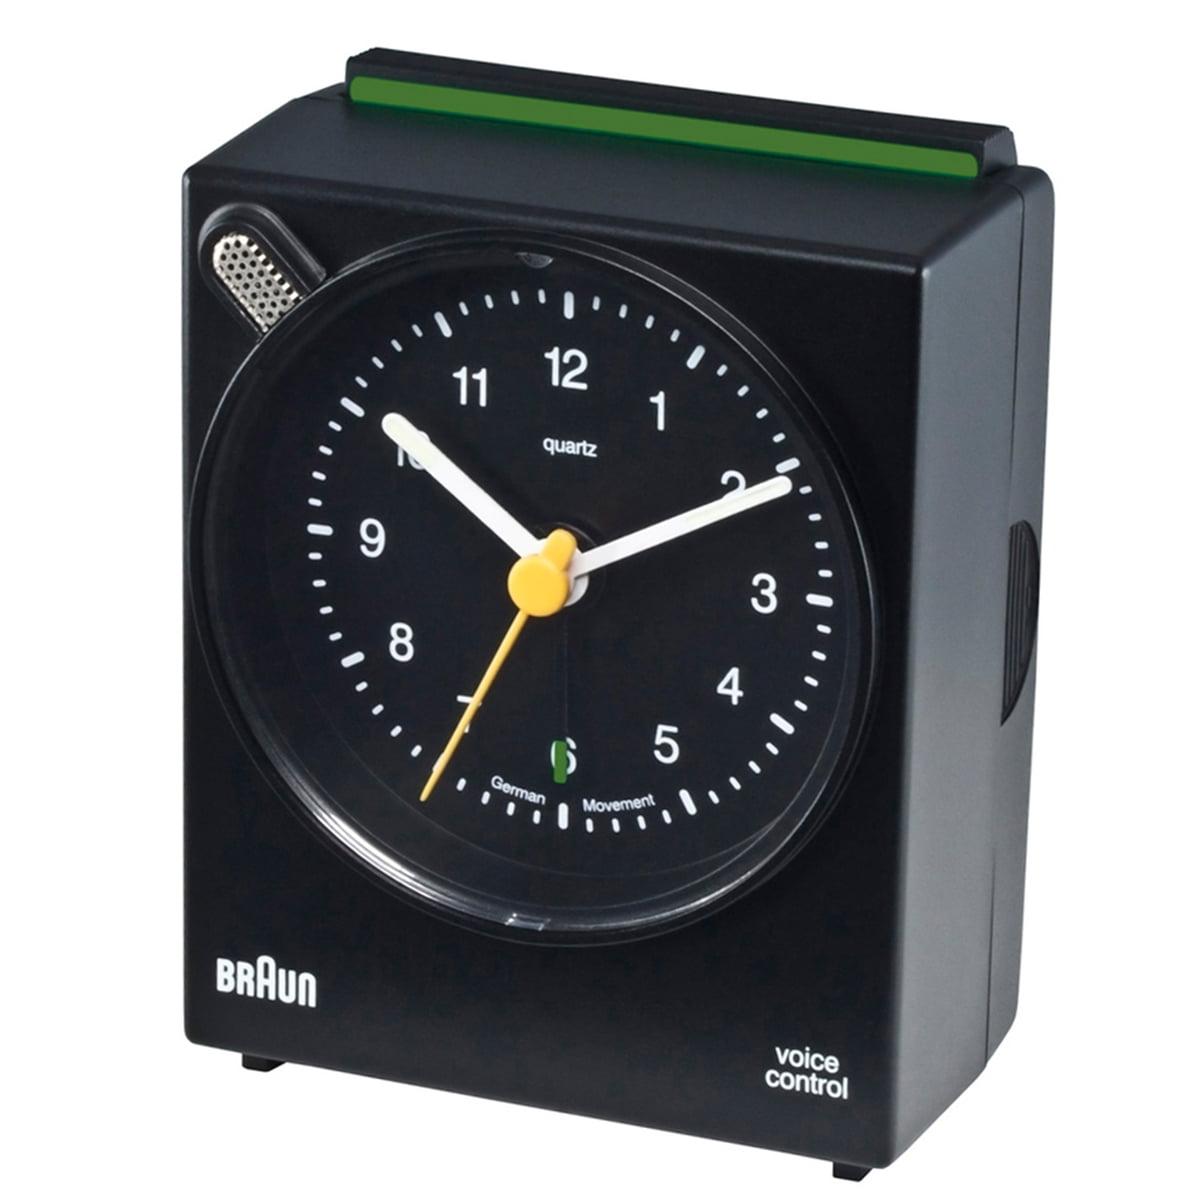 Alarm clock bnc004 braun shop braun voice activated alarm clock bnc004 amipublicfo Gallery